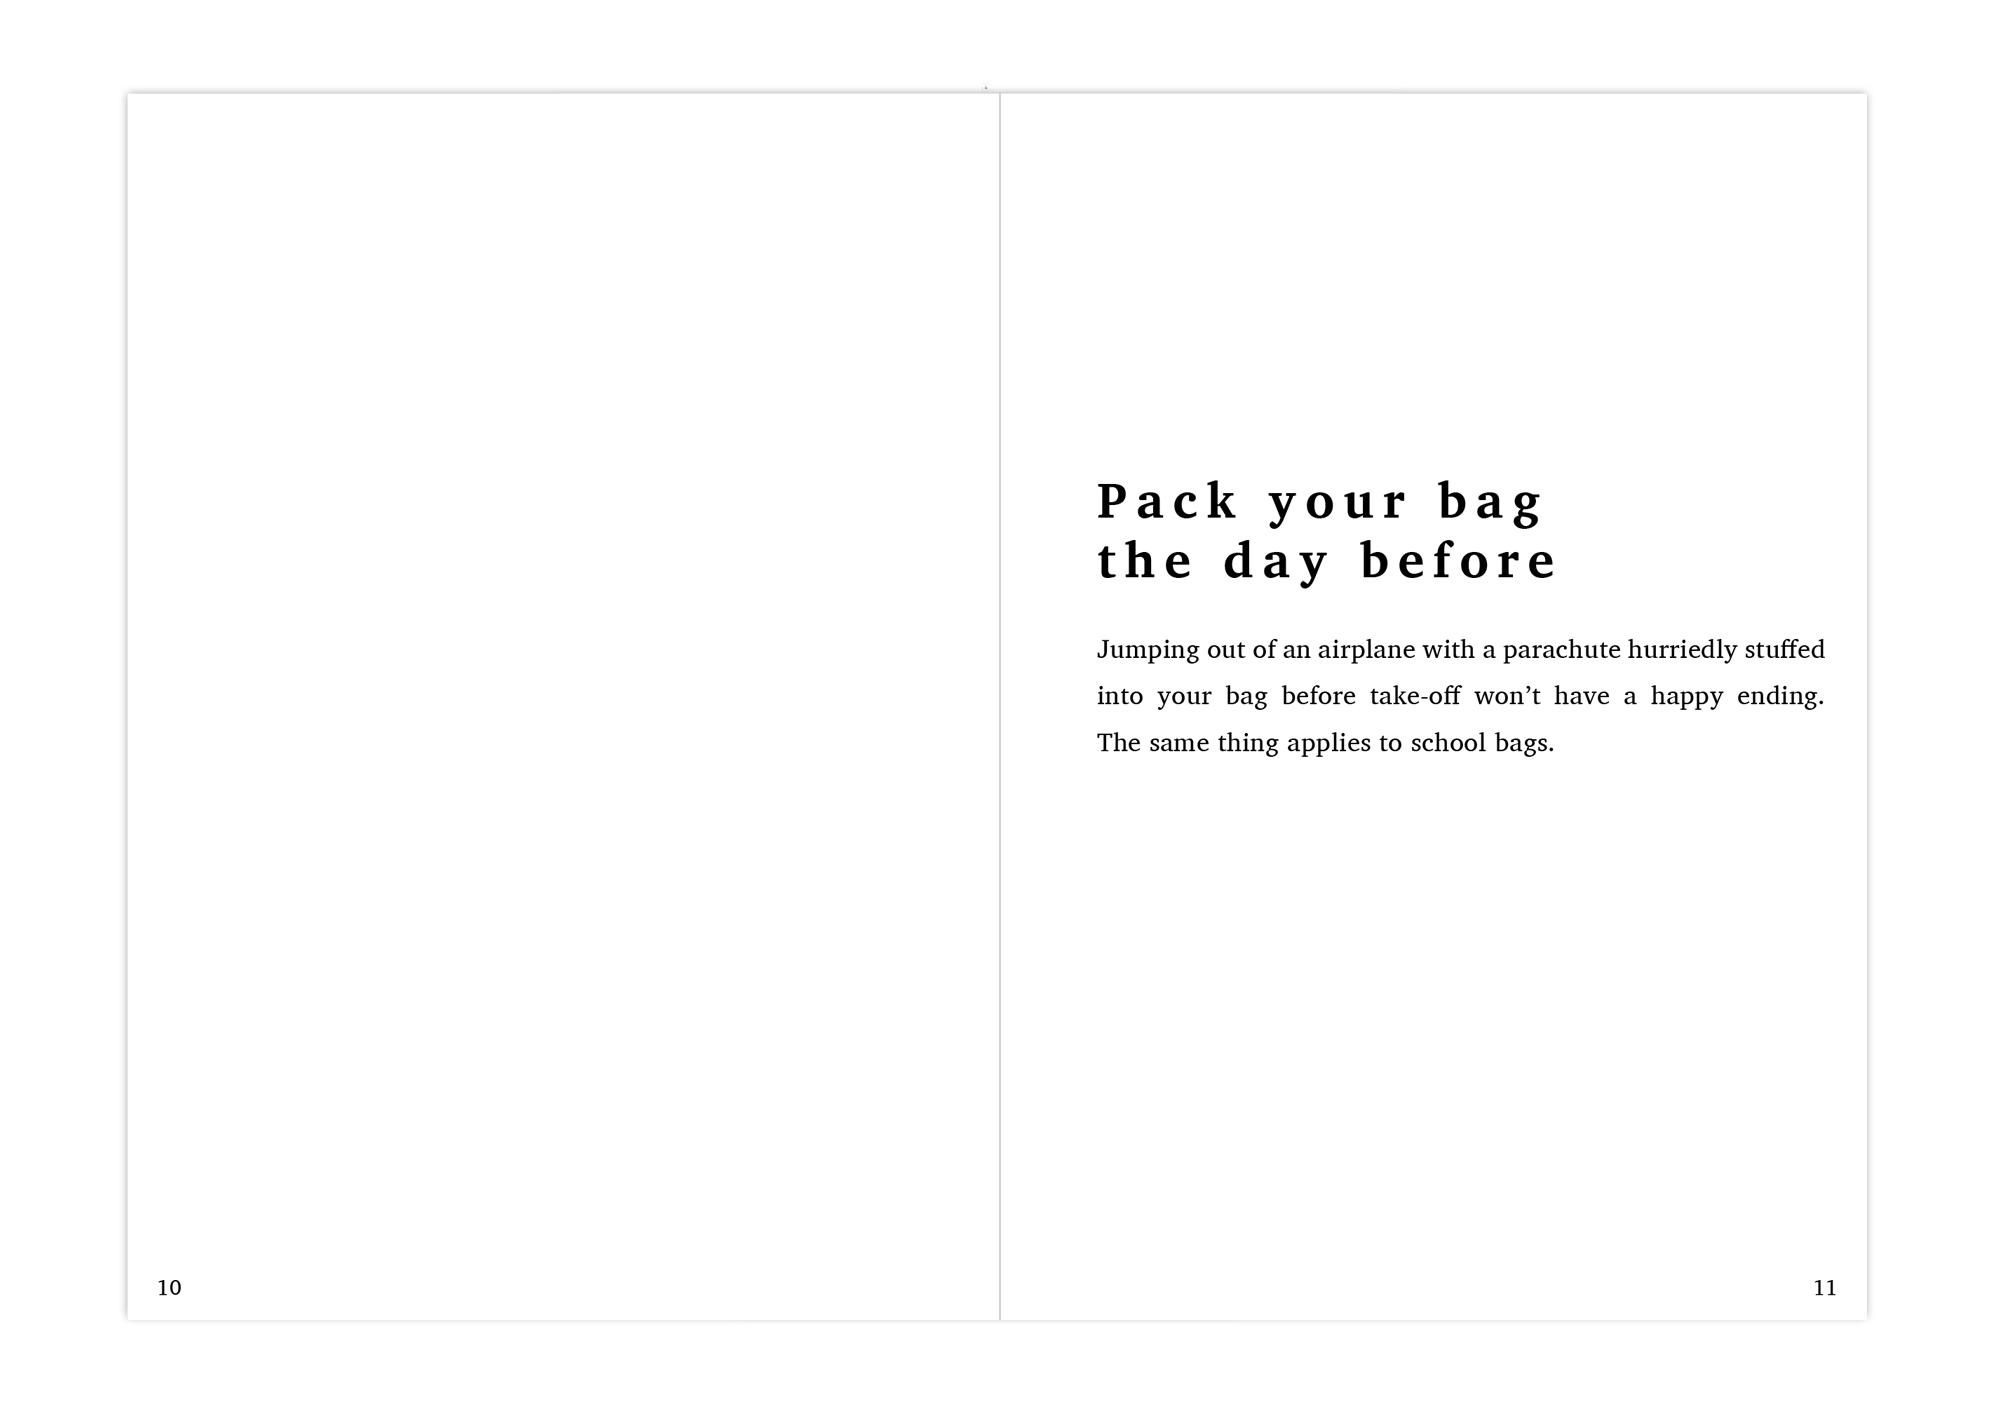 SG-Spead-pack your bag before.jpg